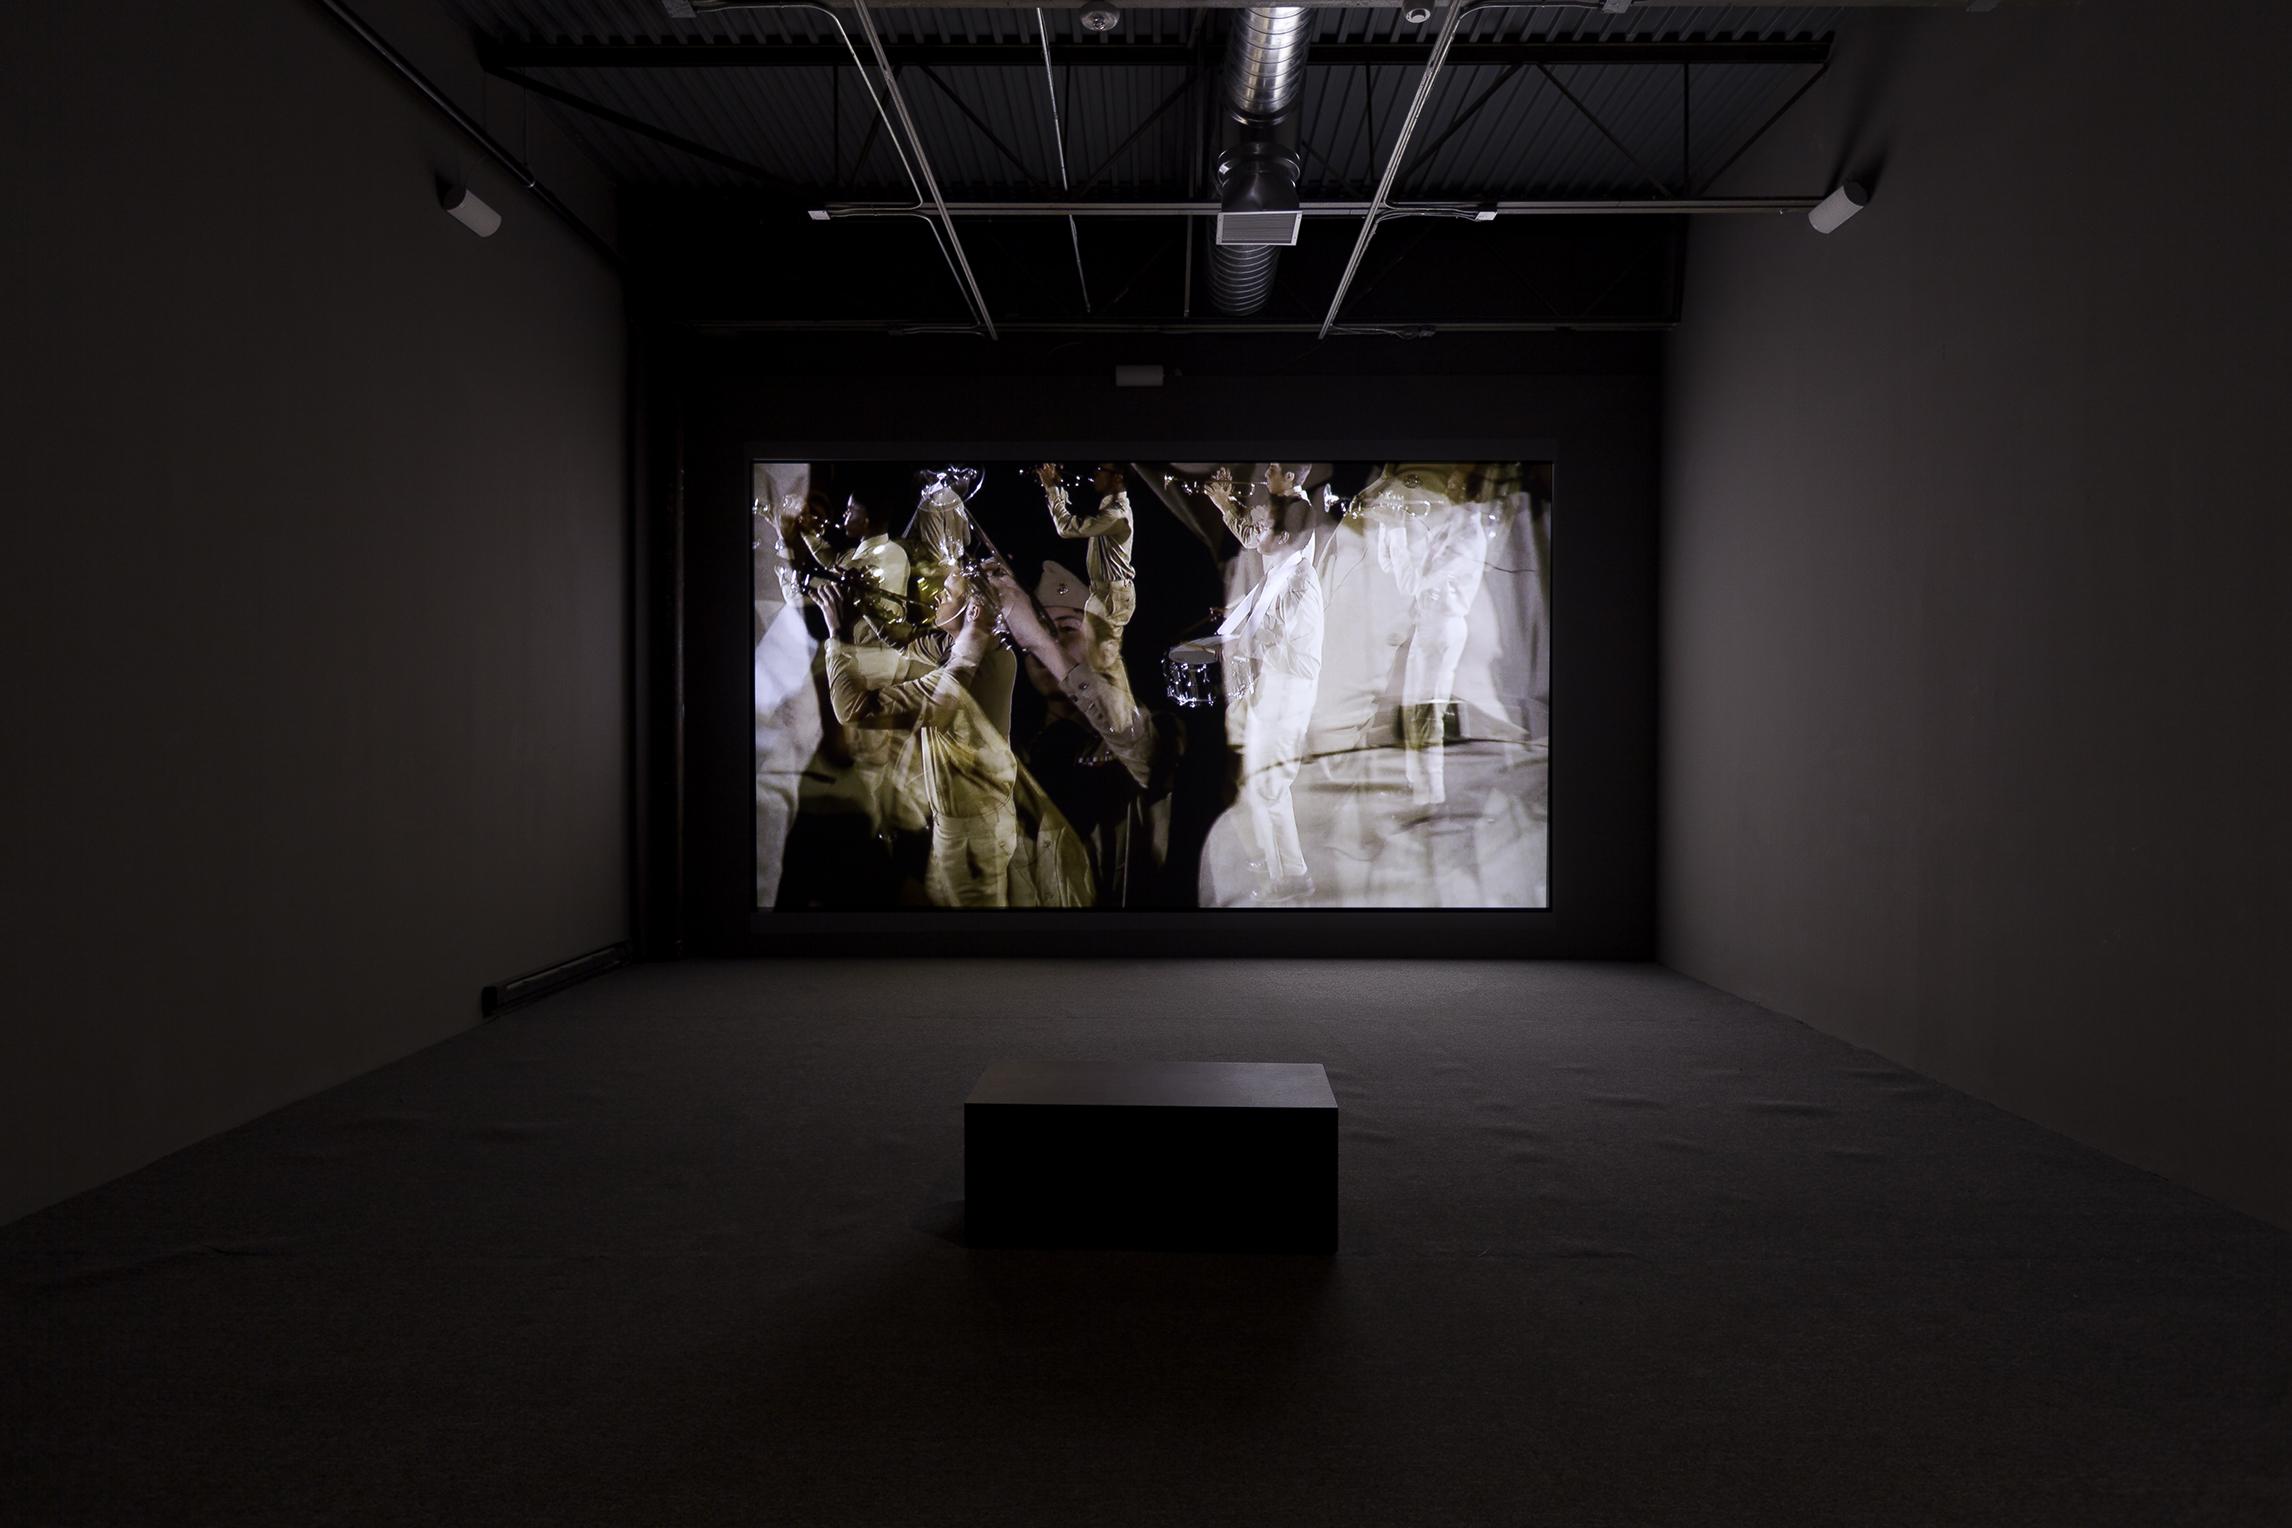 Anthems by Geof Oppenheimer 2011 installation view